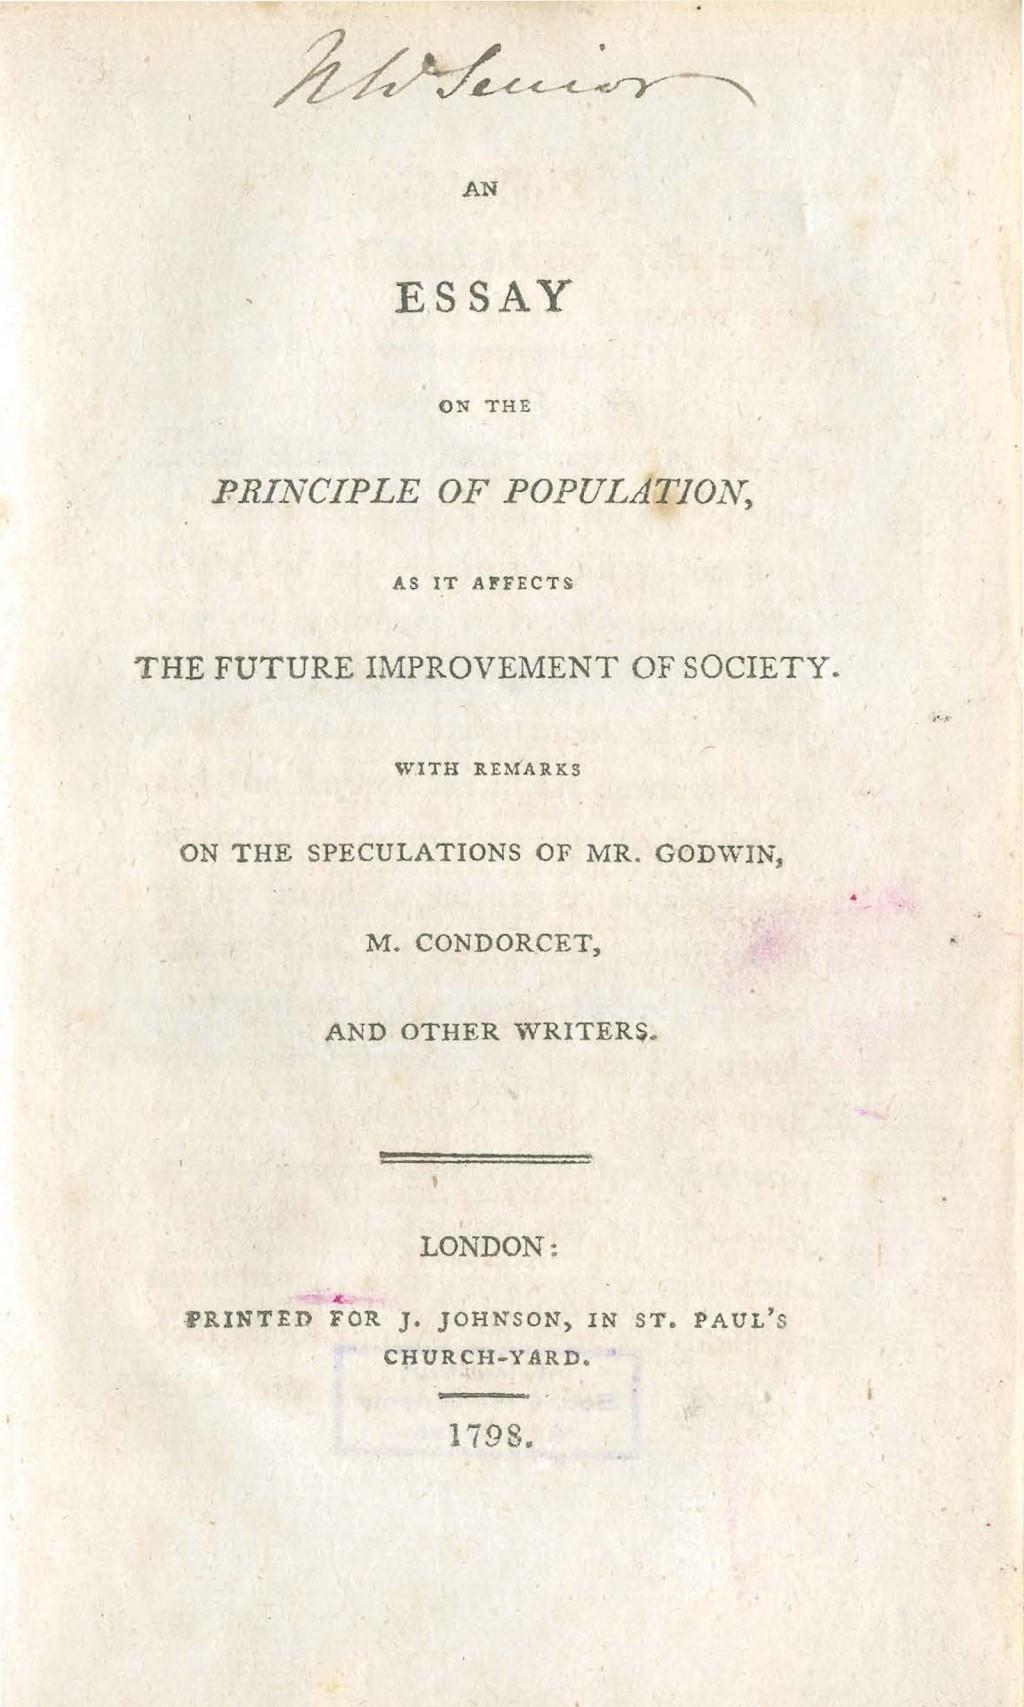 001 Thomas Malthus Essay On The Principle Of Population Stupendous After Reading Malthus's Principles Darwin Got Idea That Ap Euro Large